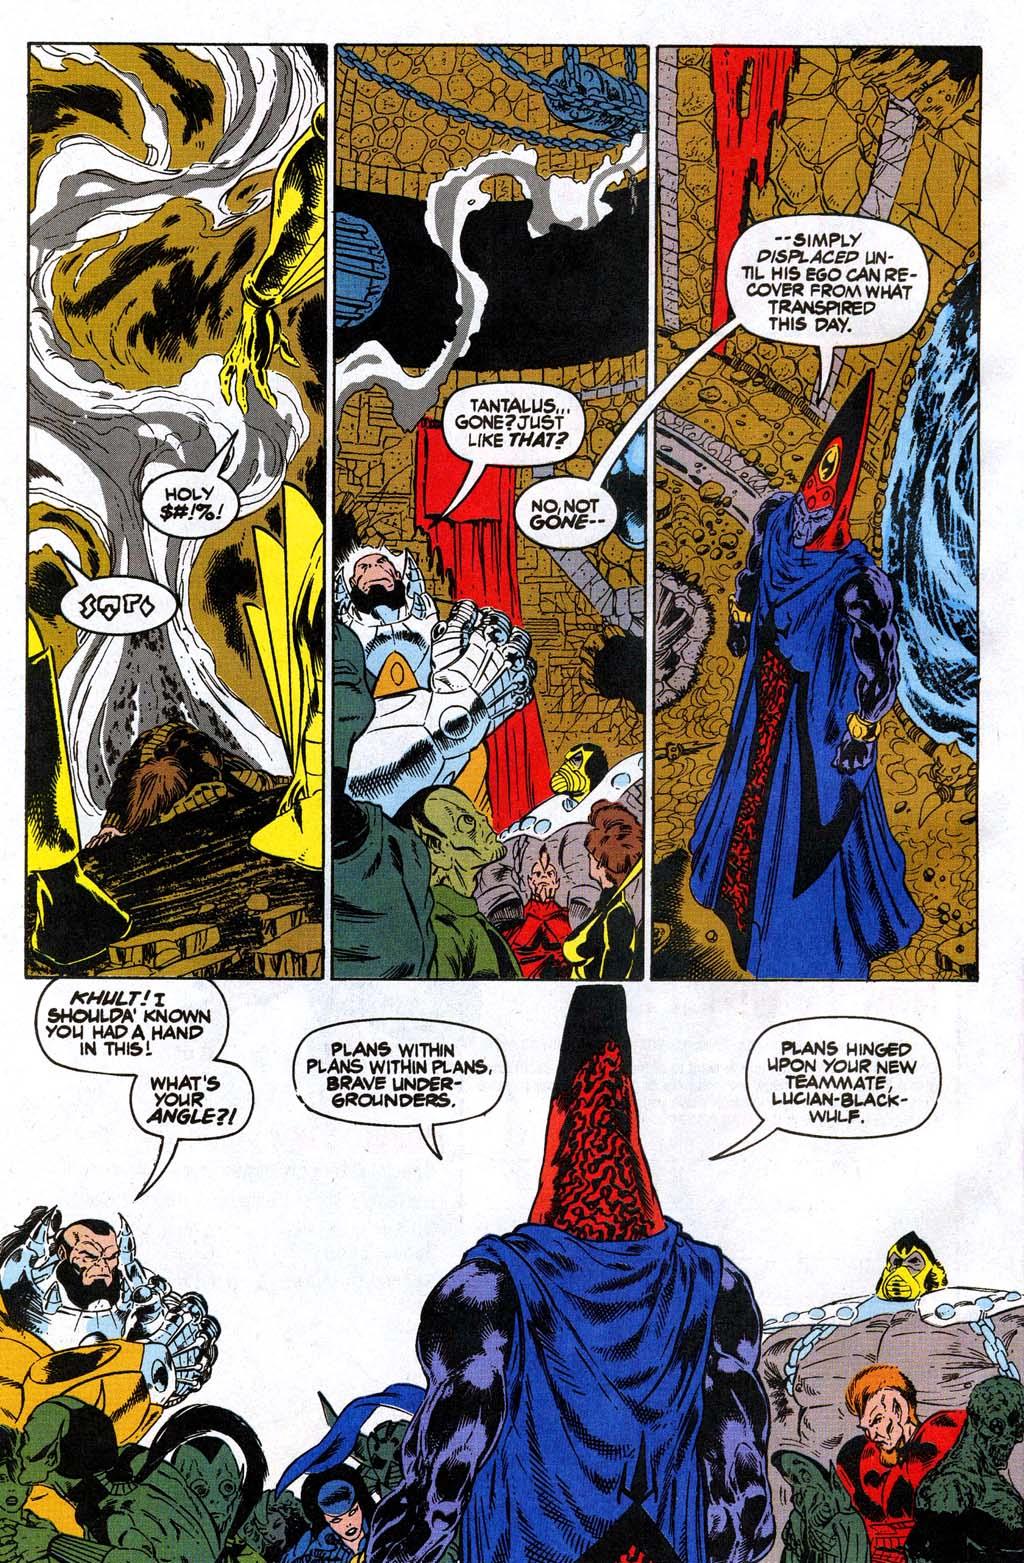 Read online Blackwulf comic -  Issue #10 - 19